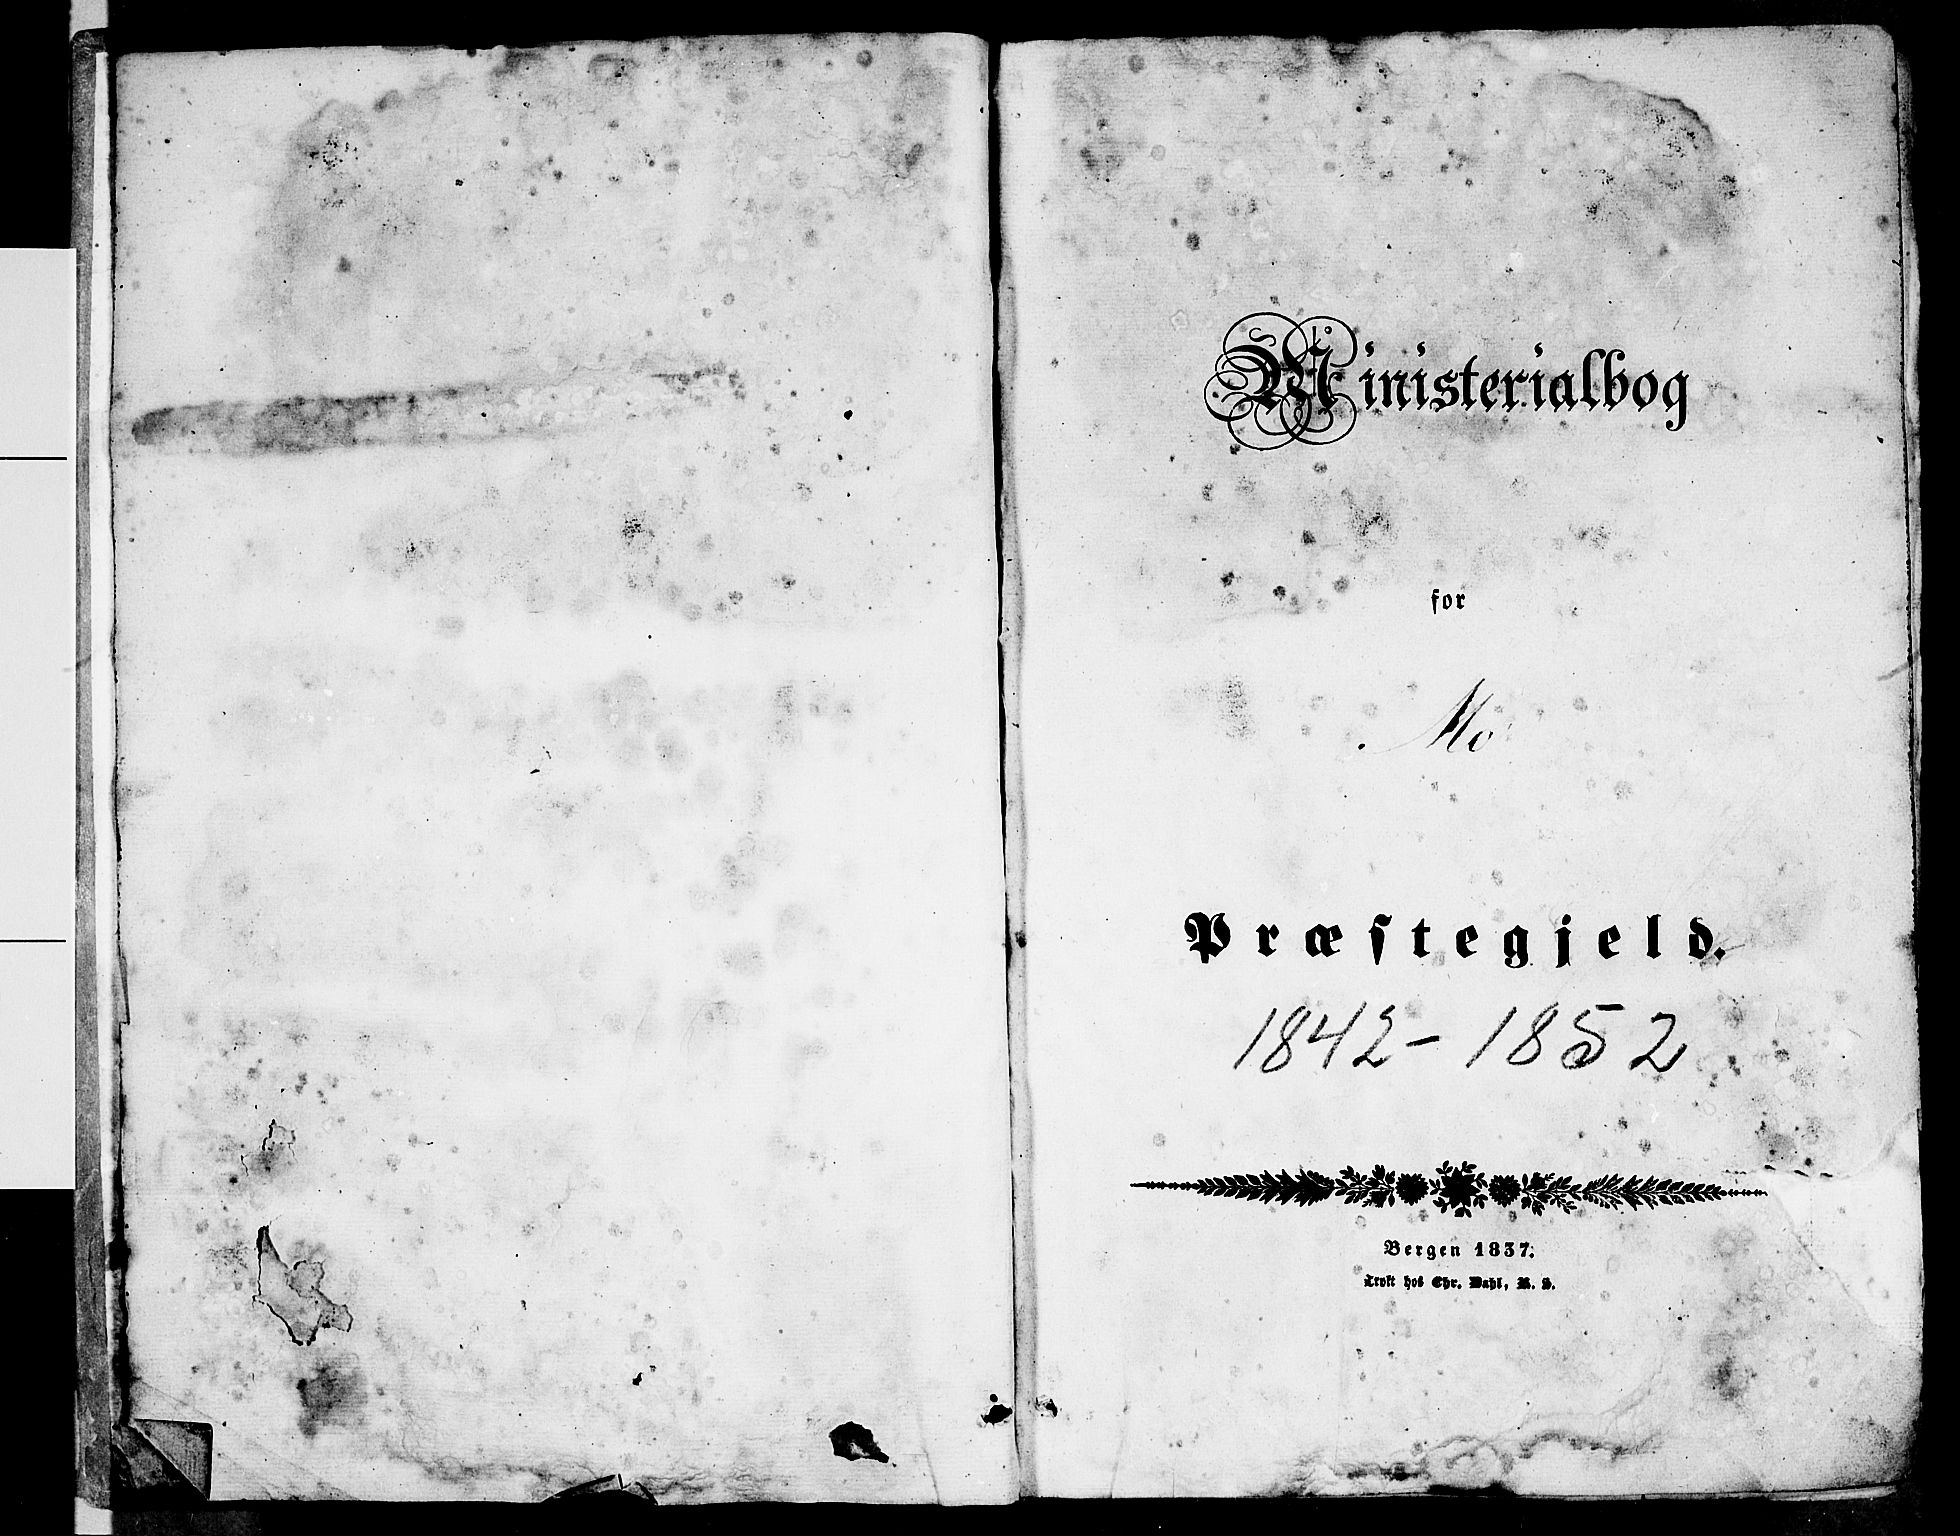 SAT, Ministerialprotokoller, klokkerbøker og fødselsregistre - Nordland, 827/L0413: Klokkerbok nr. 827C02, 1842-1852